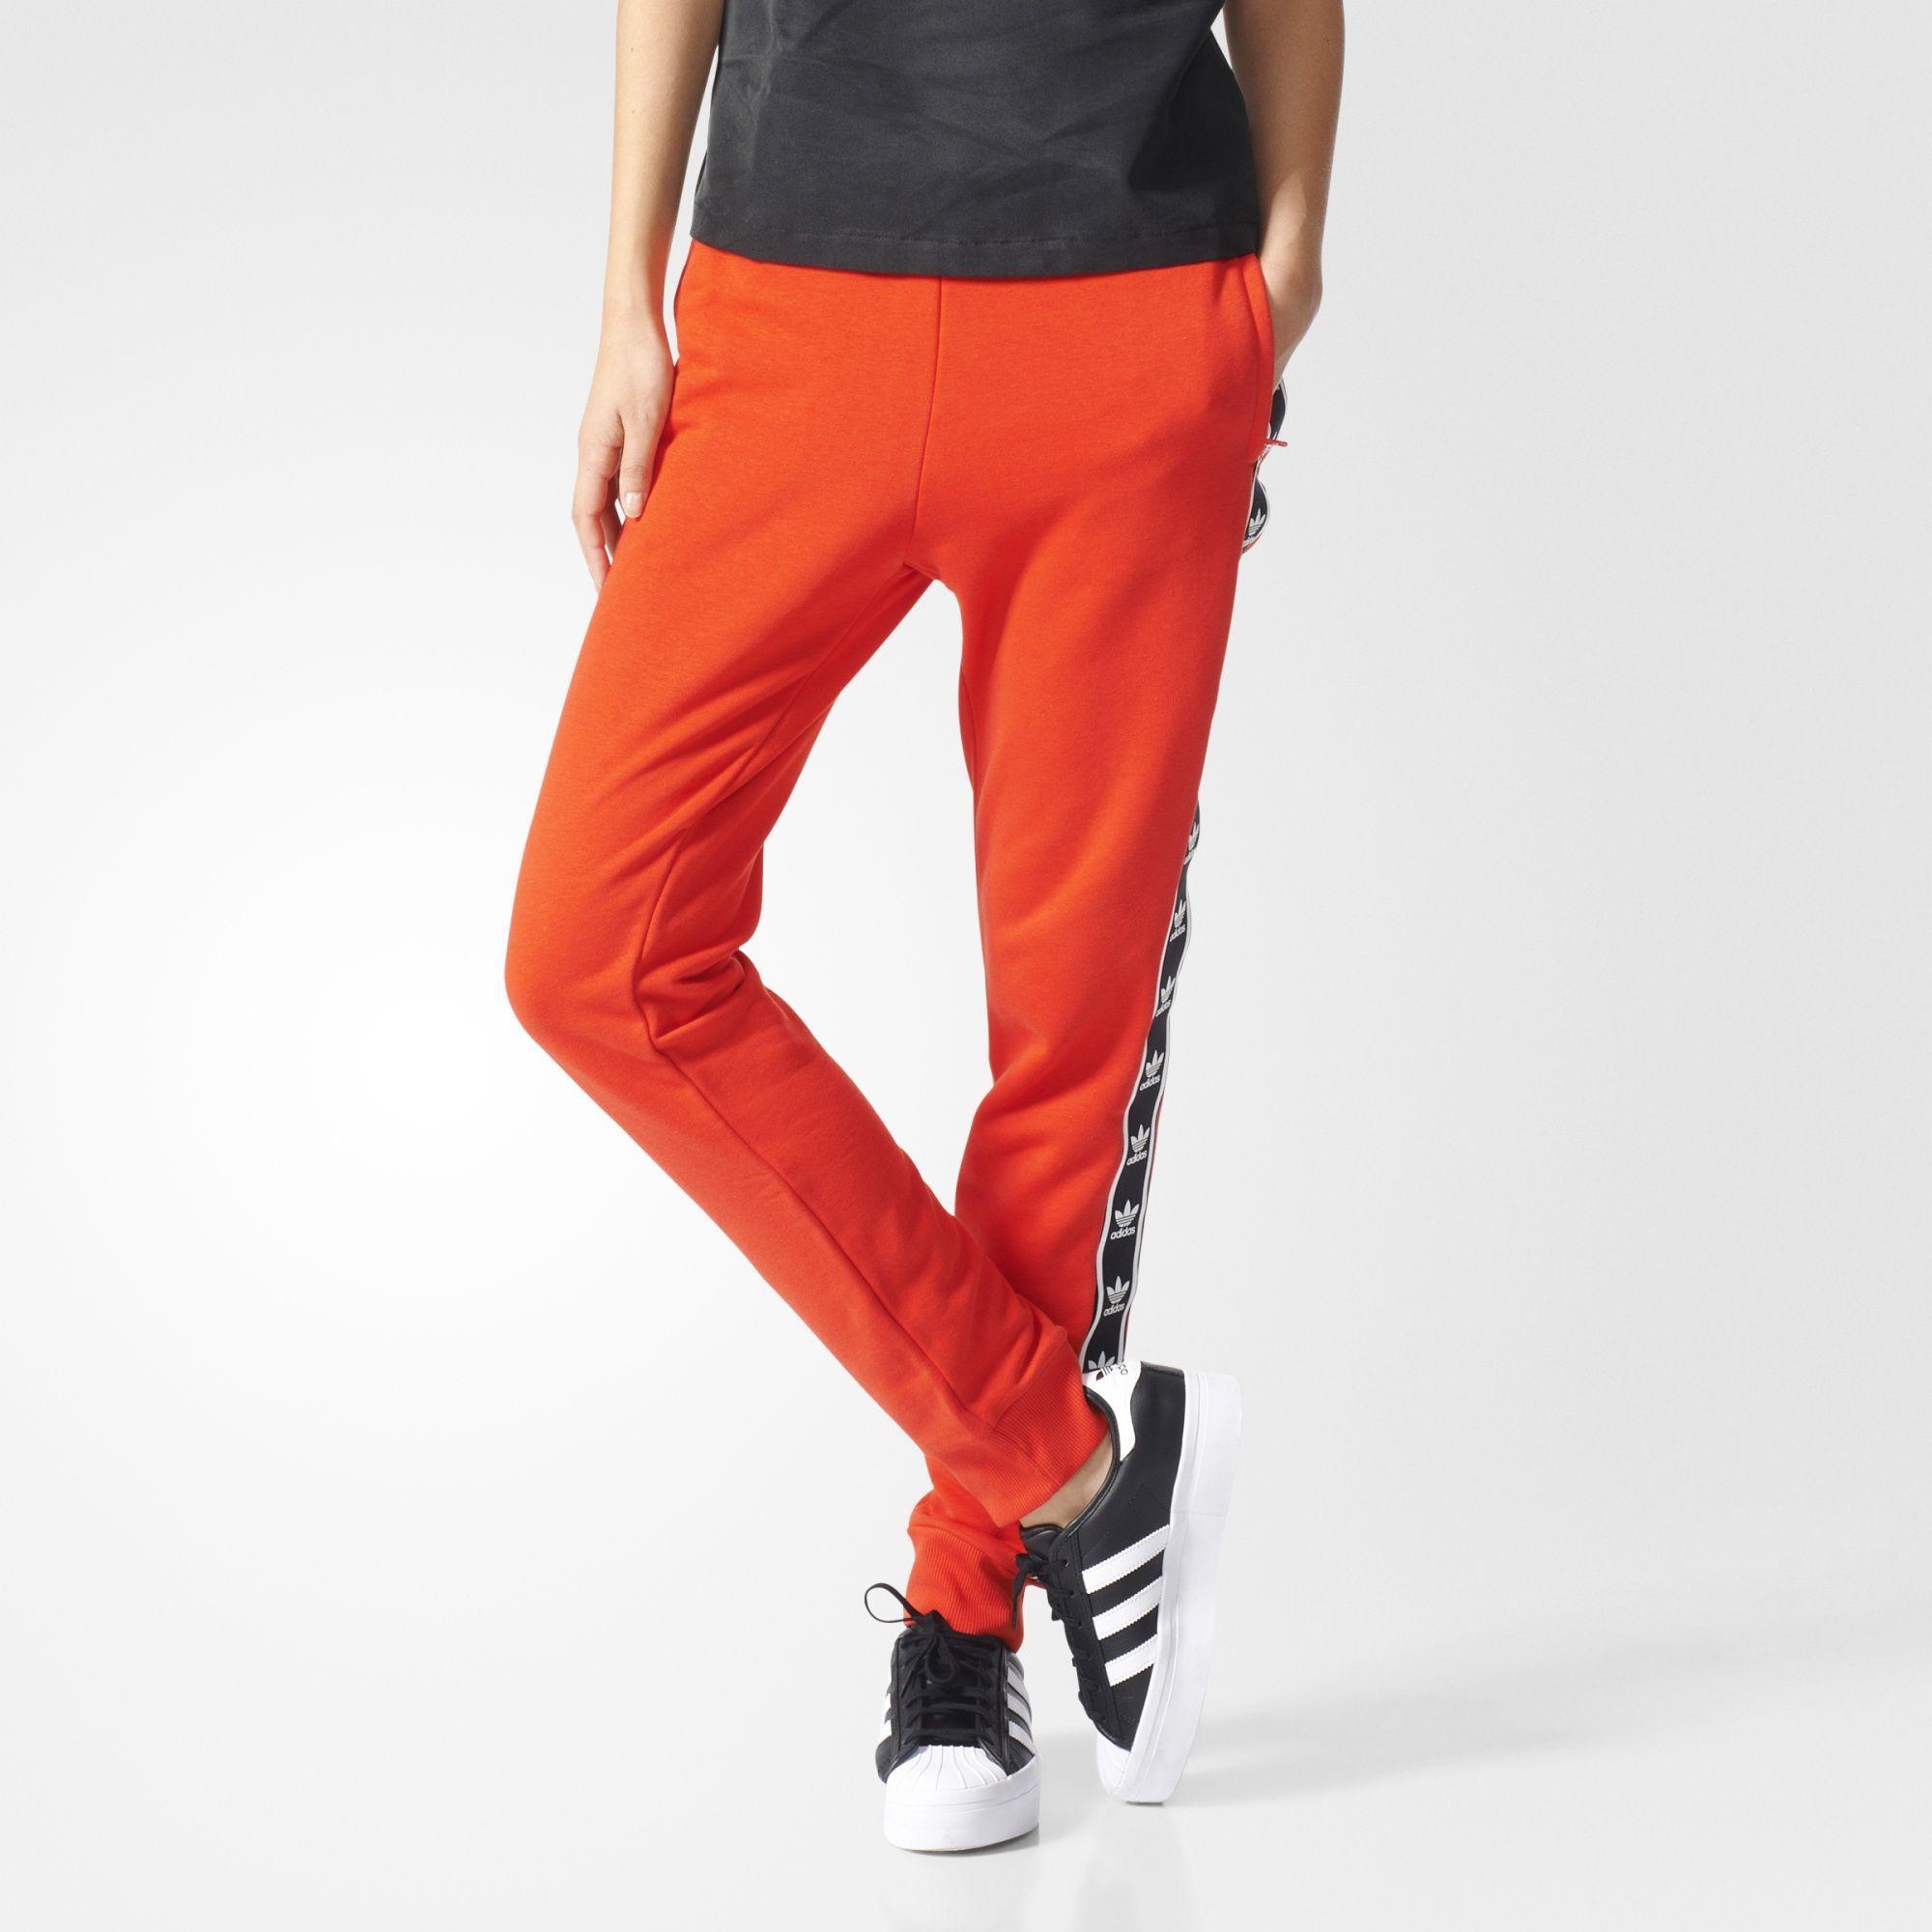 adidas - Pantalon de survêtement Cuffed   clothes   Pinterest ... ae335f4517a7